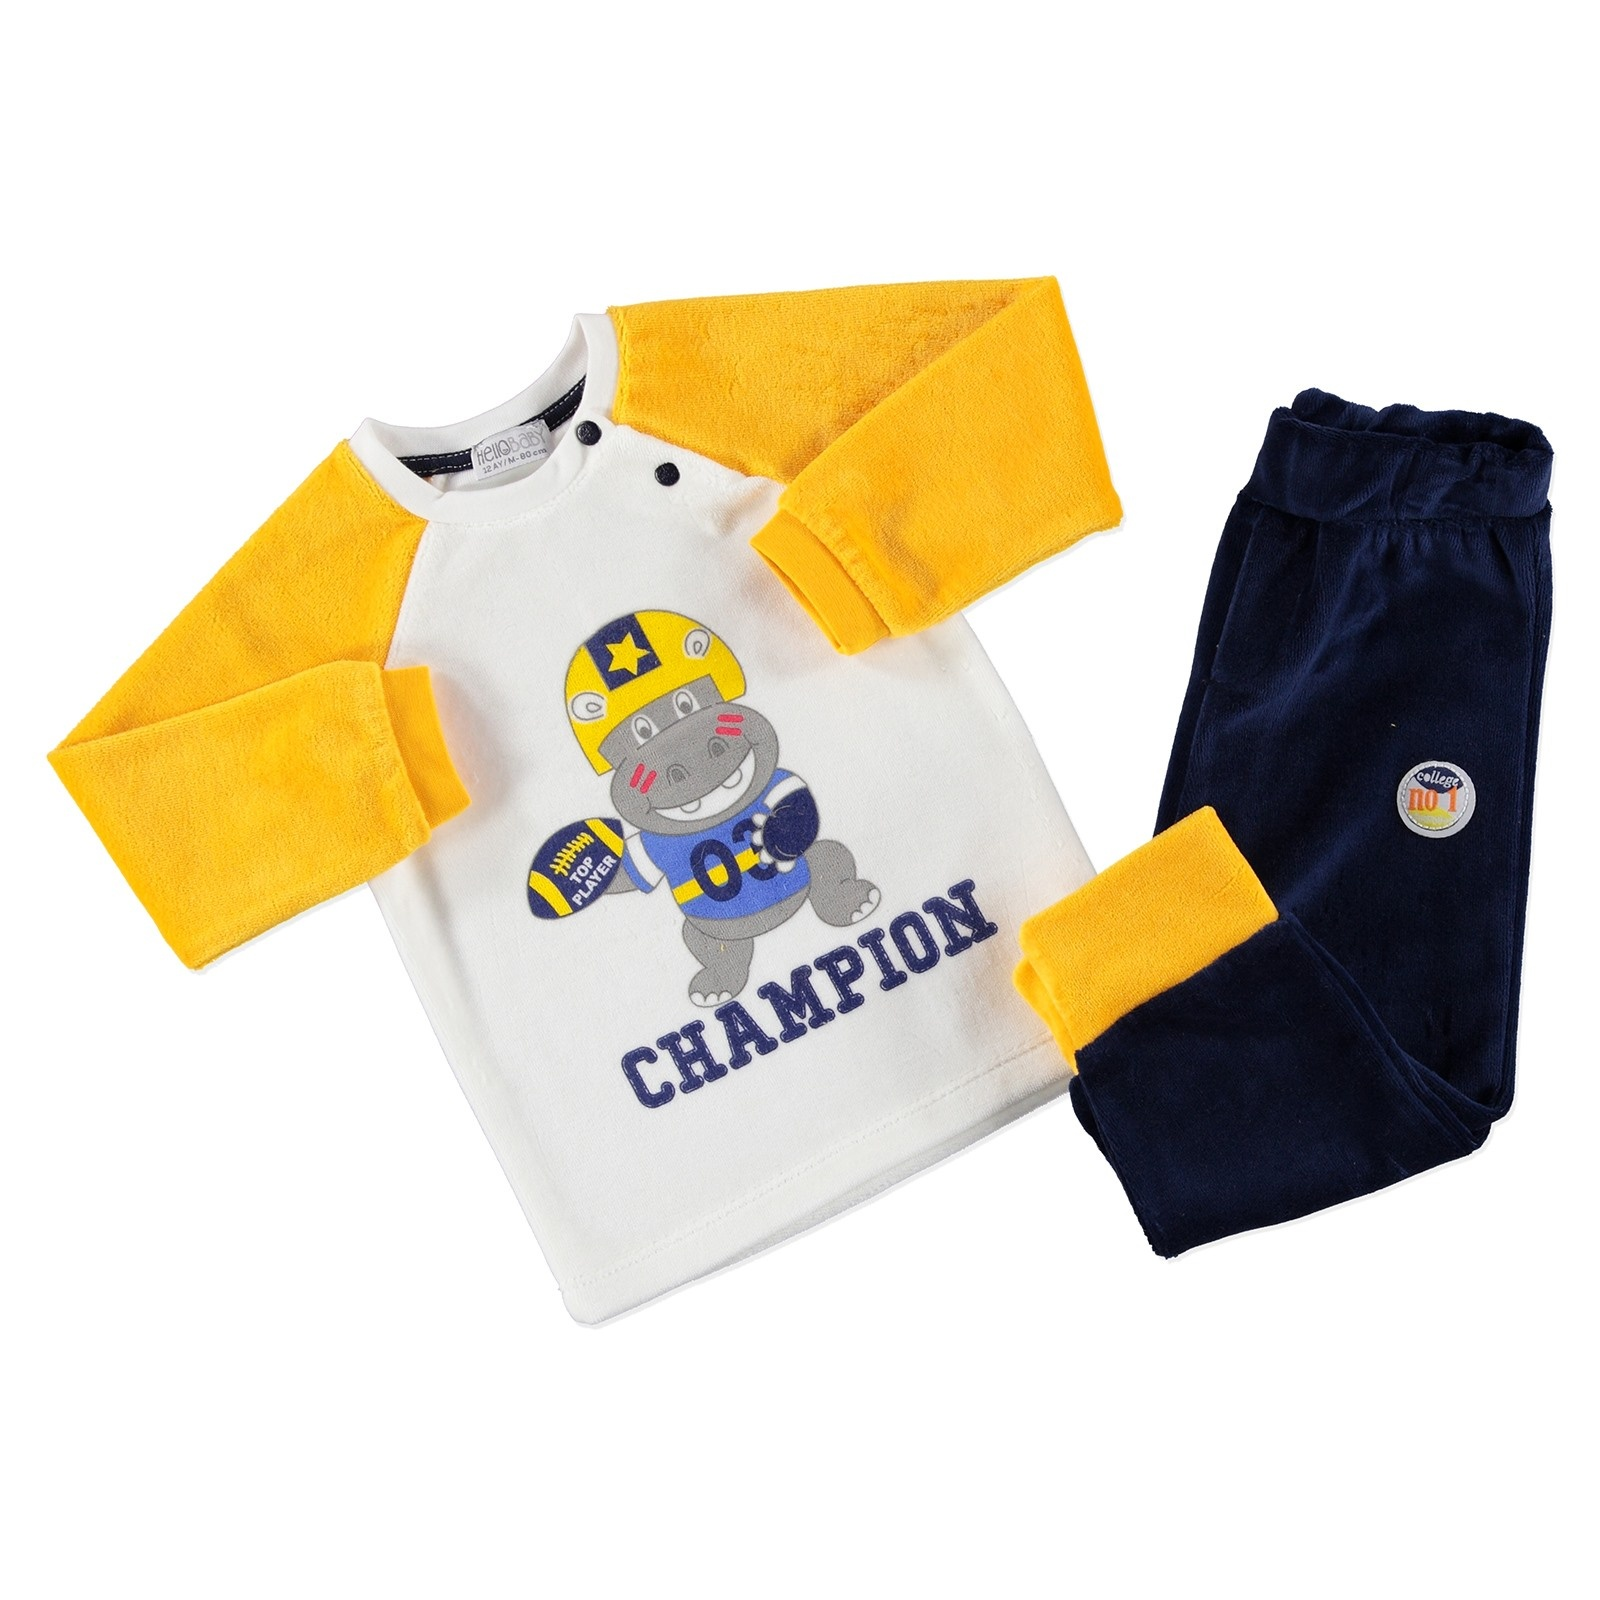 Ebebek HelloBaby Little Champion Baby Sweatshirt Trouser 2 Pack Set